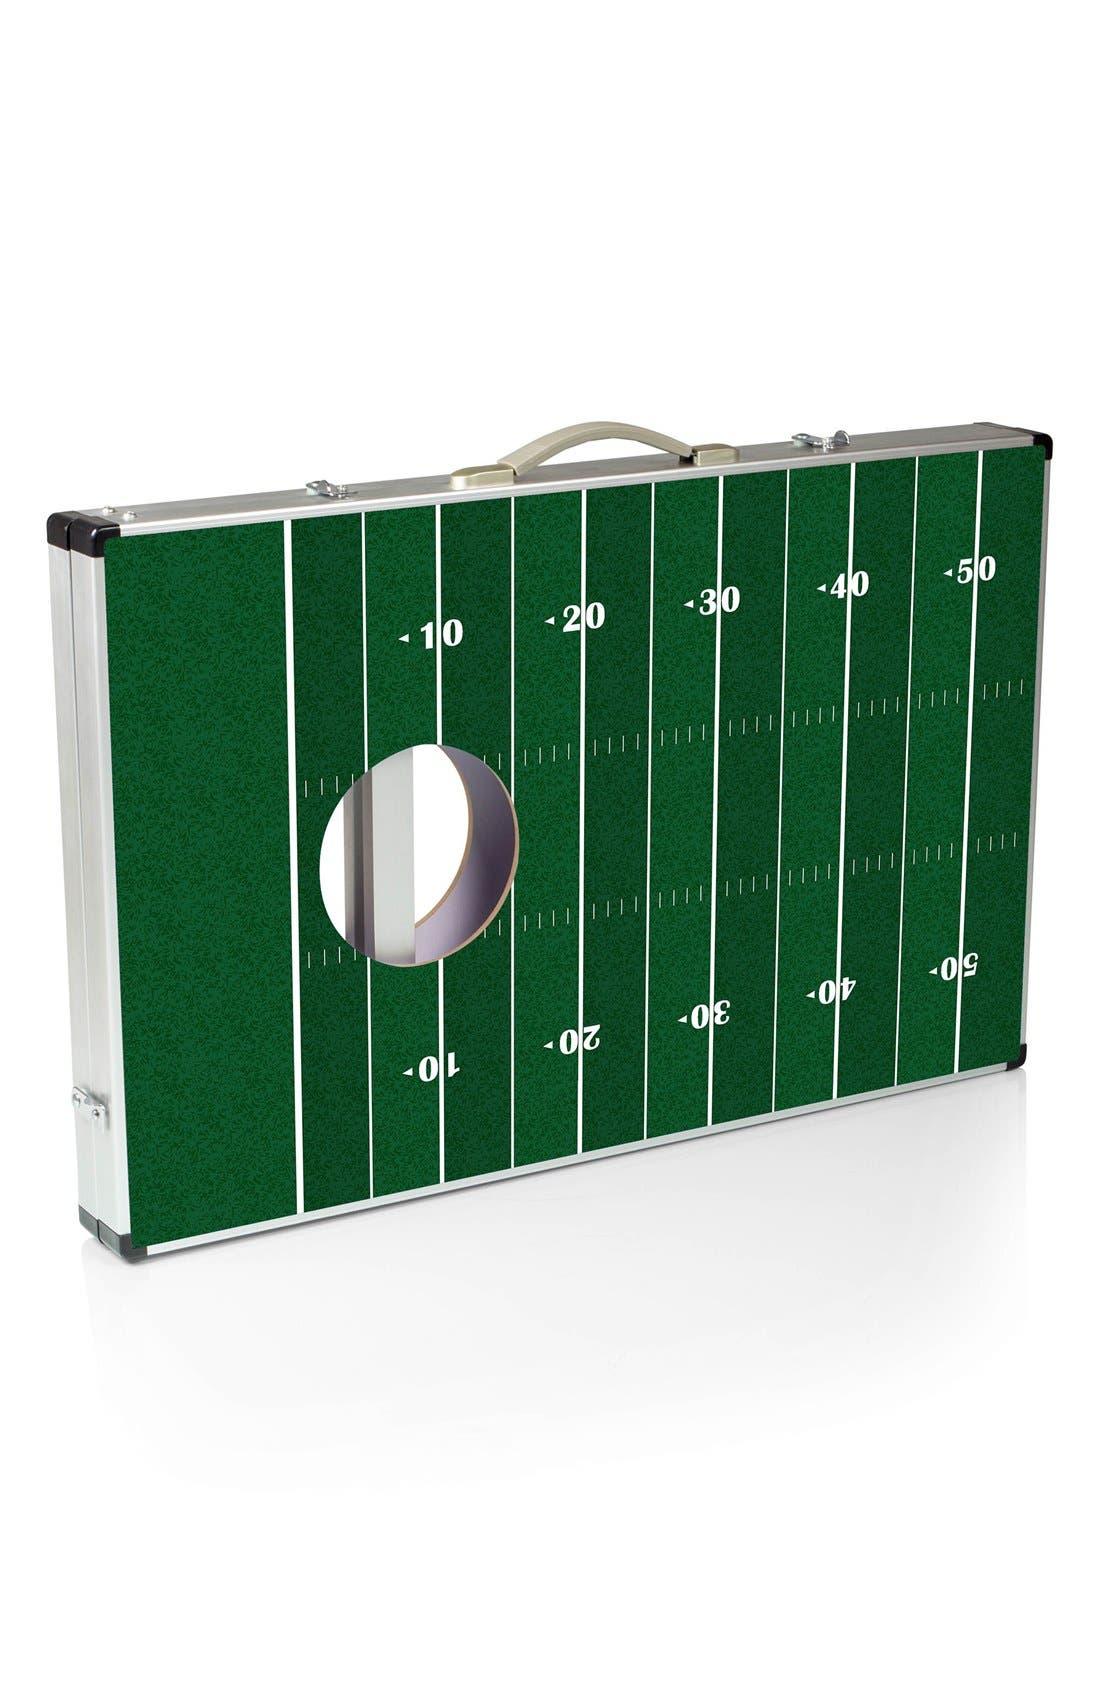 'Football' Bean Bag Toss Game,                             Alternate thumbnail 2, color,                             GREEN